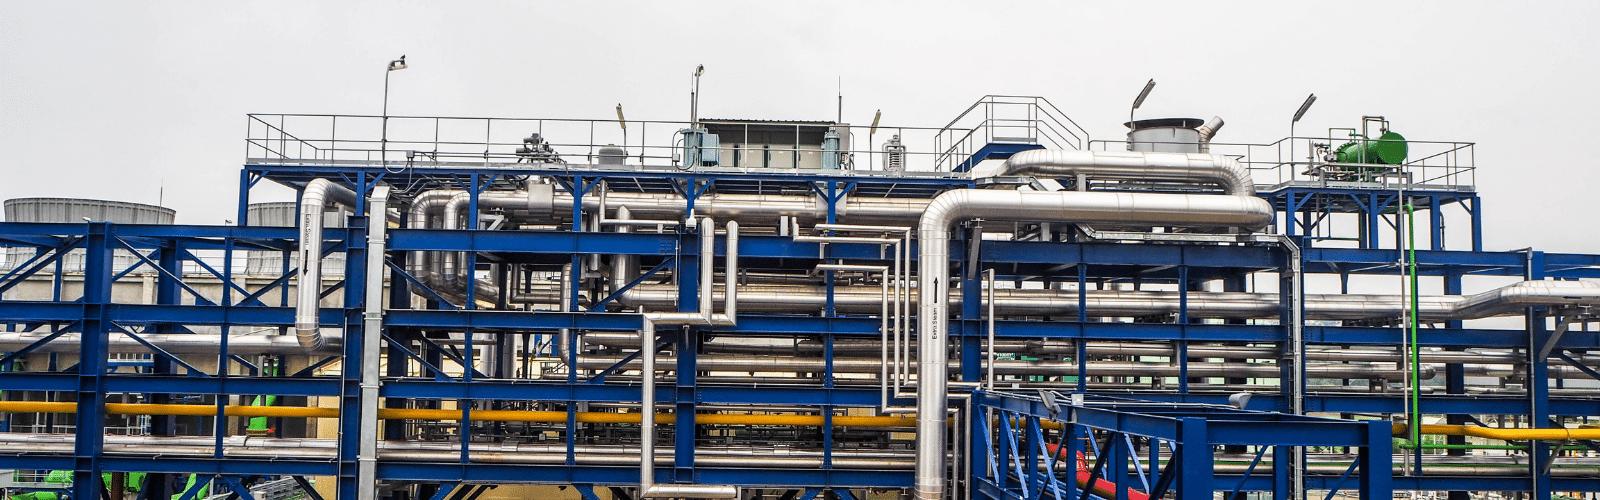 pipe racks